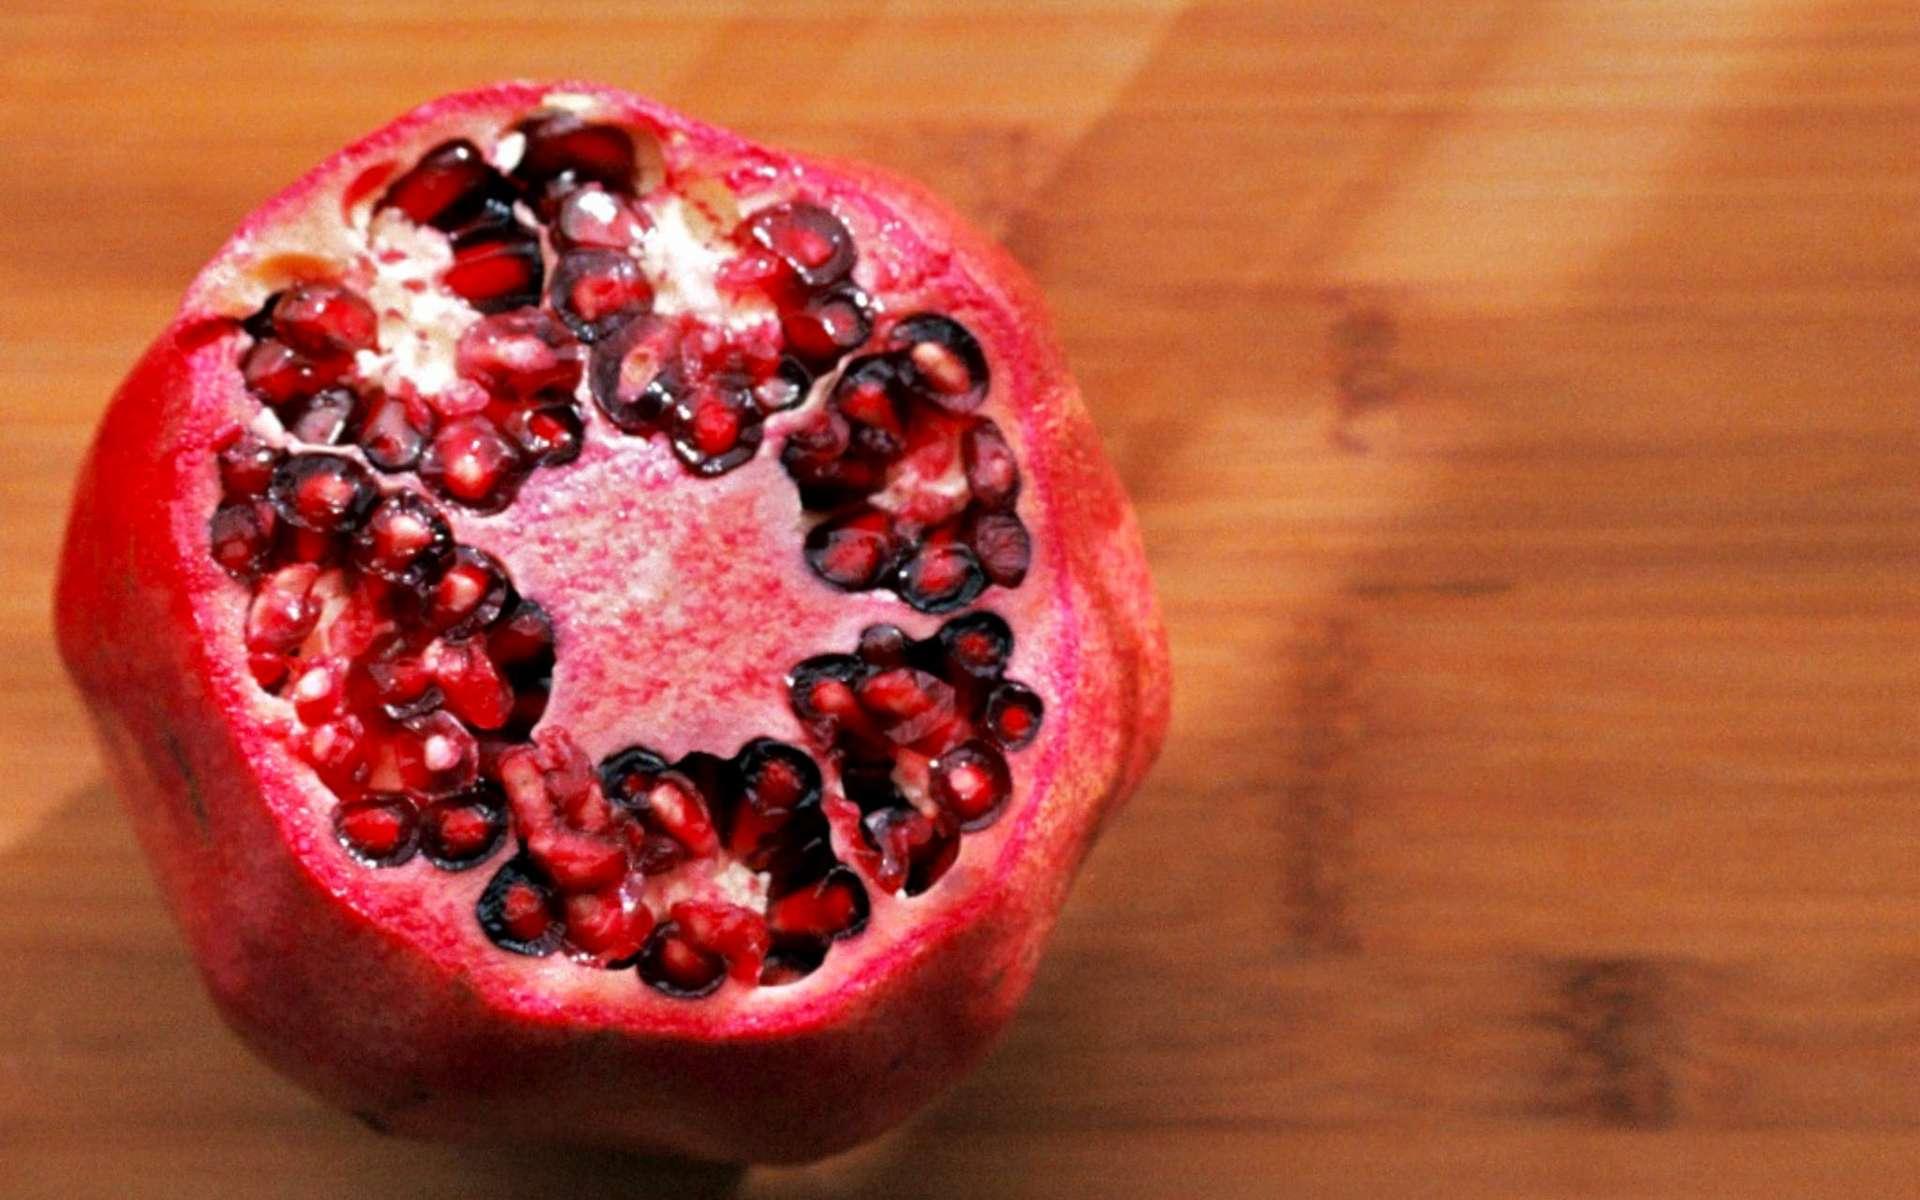 Grenade : origine et qualités nutritionelles © Nico Paix, Flickr